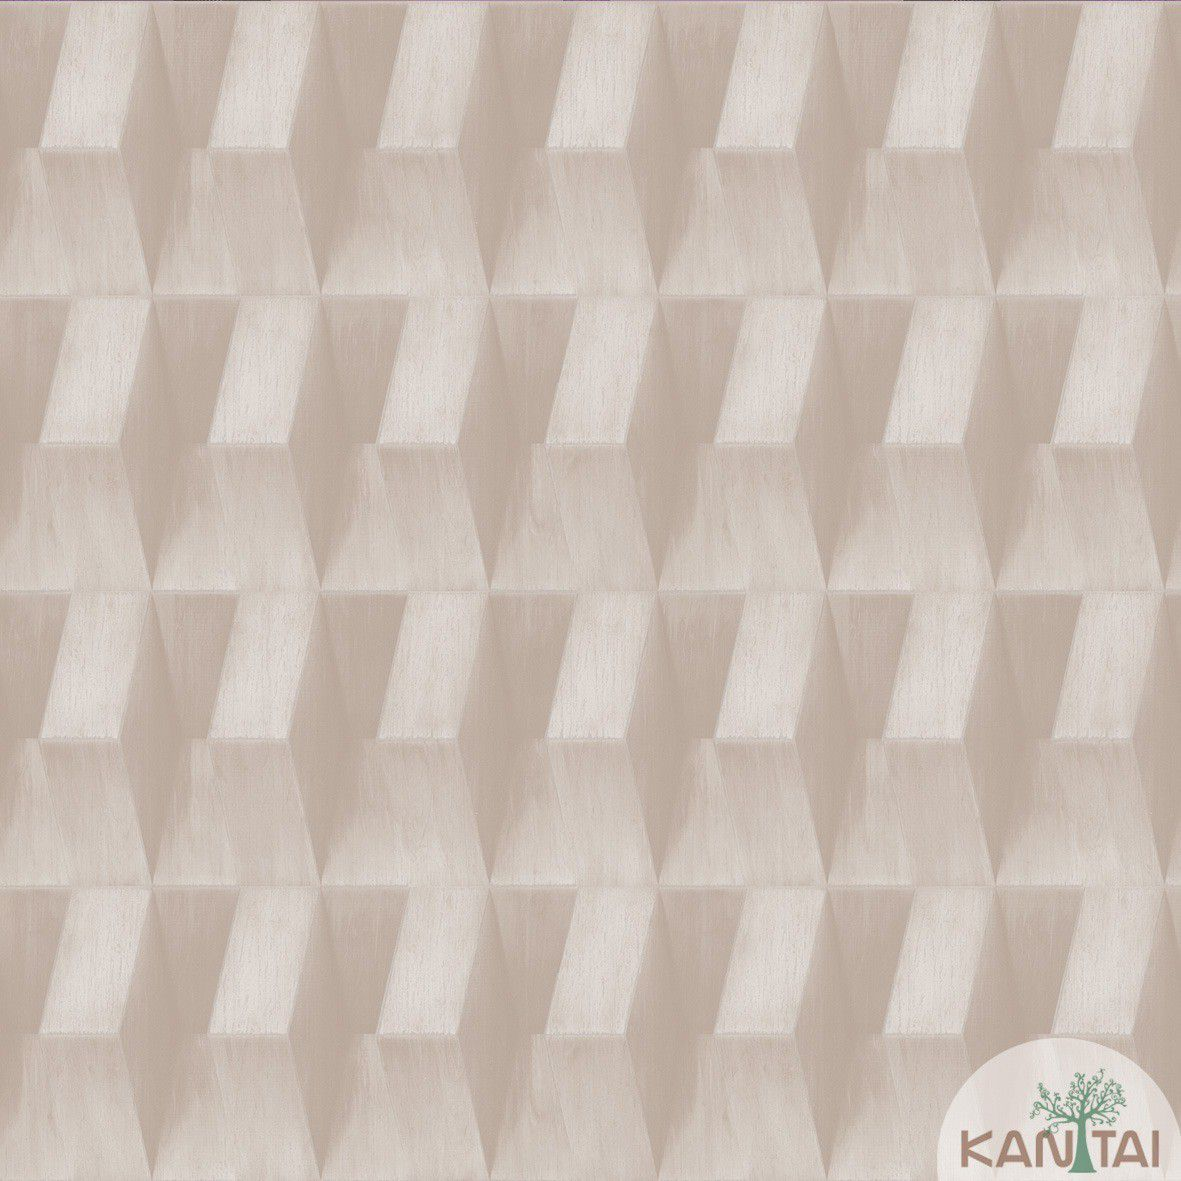 Papel de Parede  Kan Tai  Vinilico Coleção Neonature III 3D Geométrico Marrom Claro, Bege